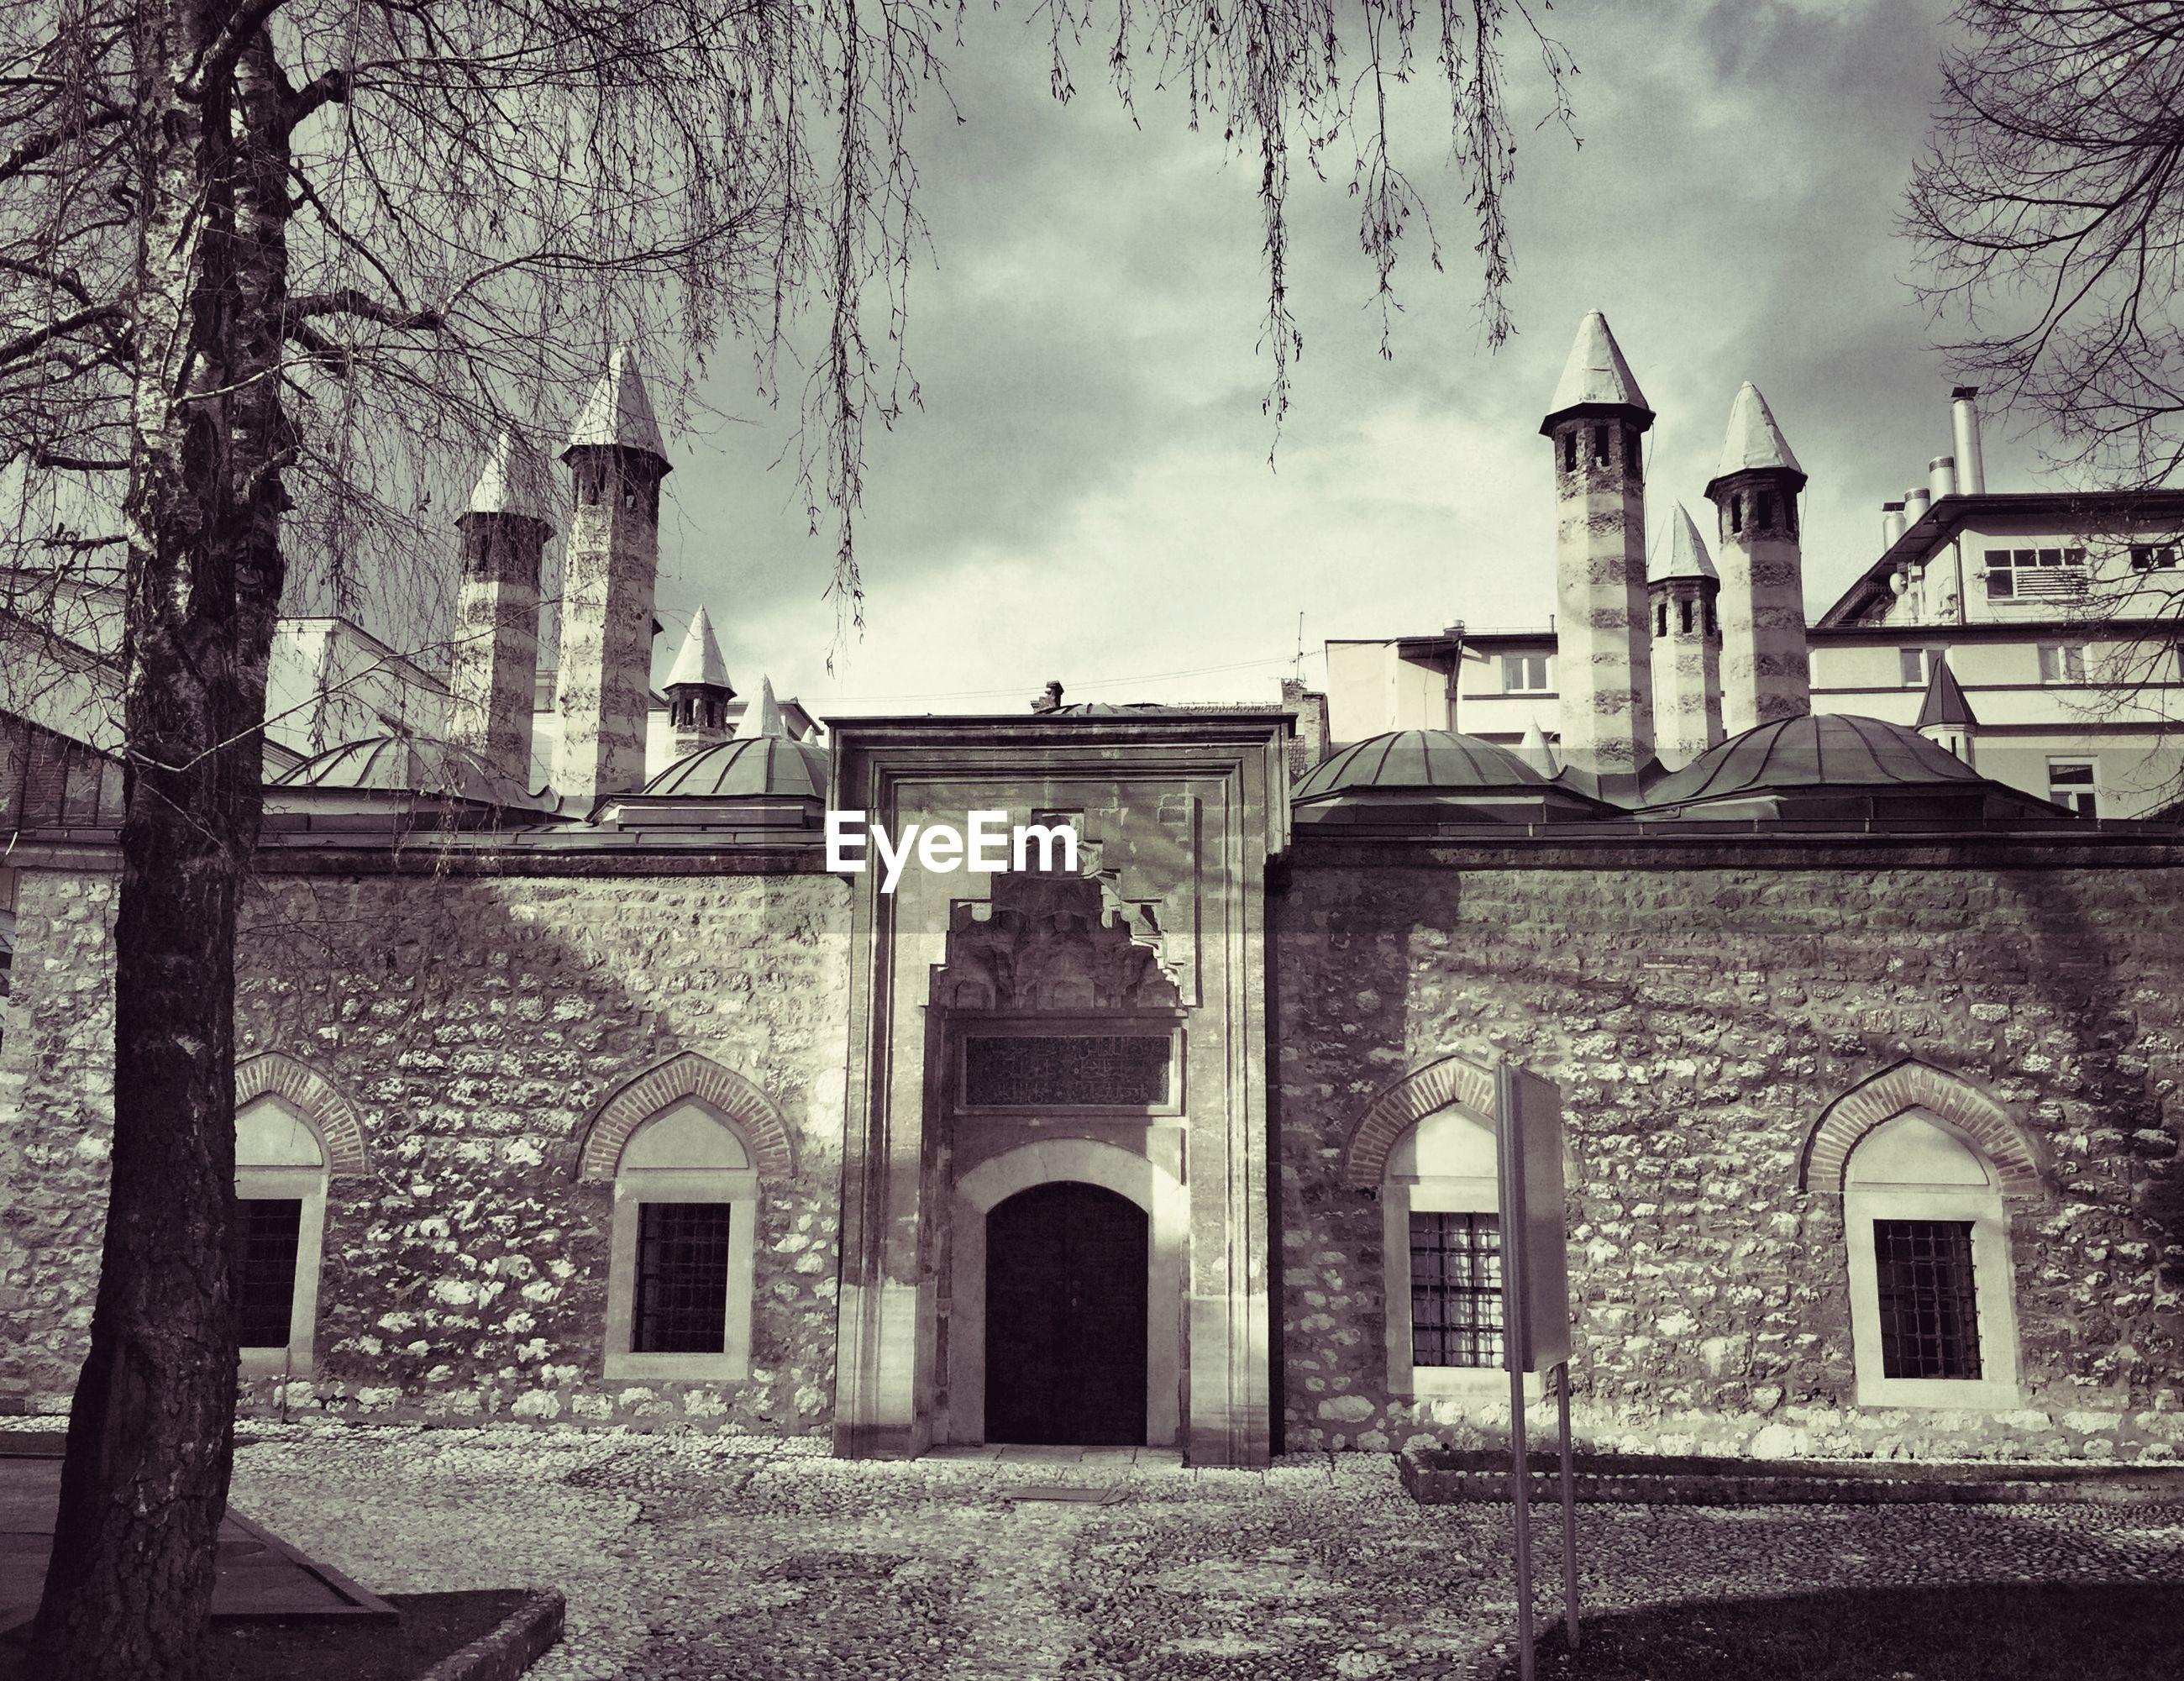 Gazi husrev-beg mosque against cloudy sky